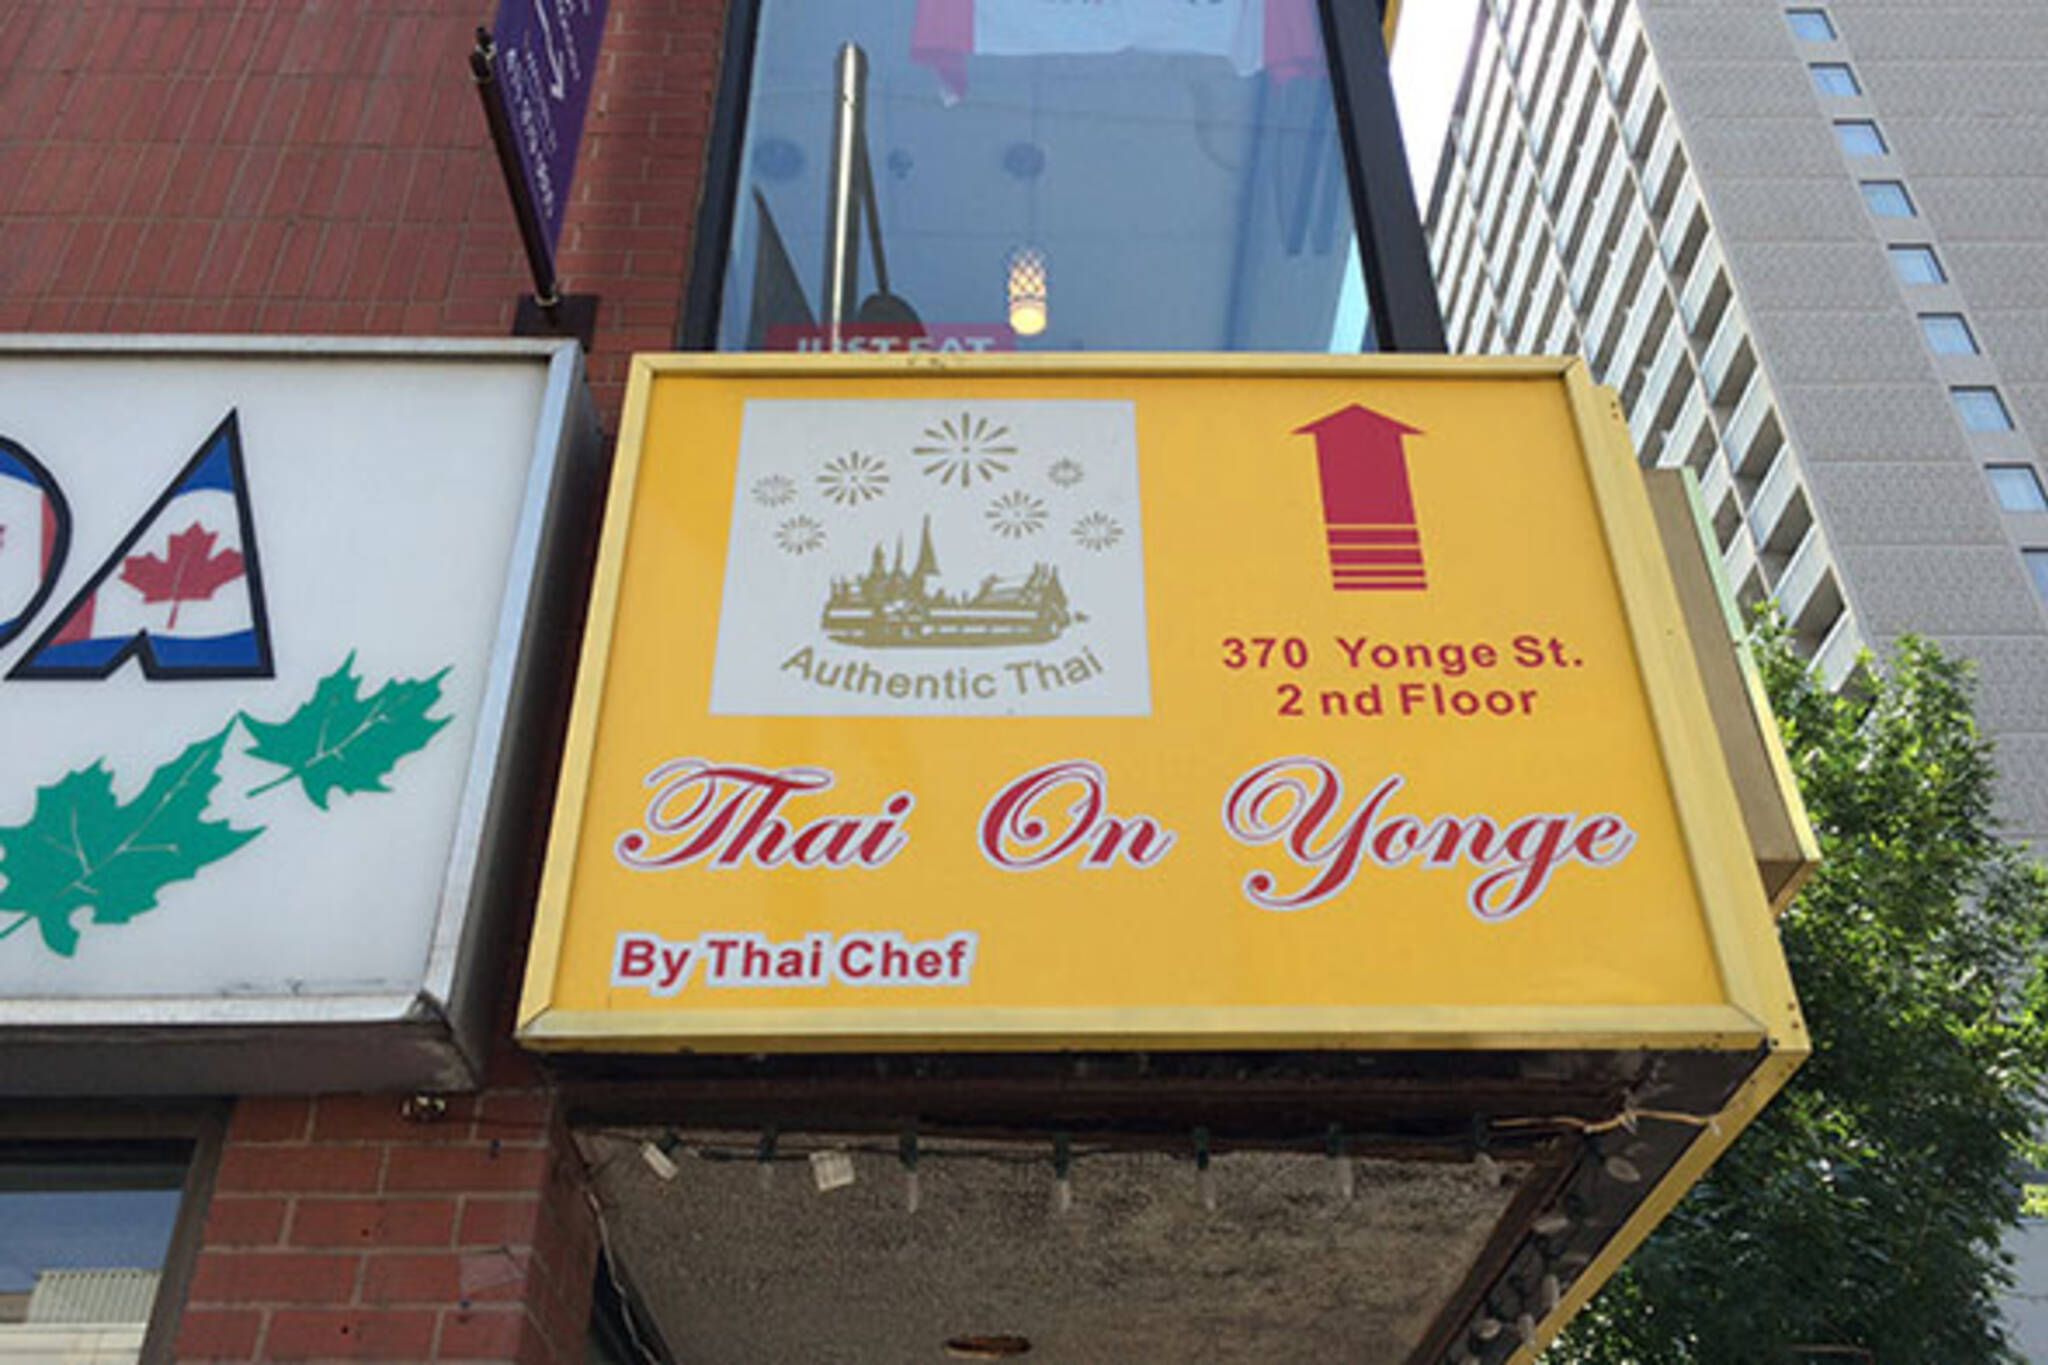 Thai on yonge Toronto